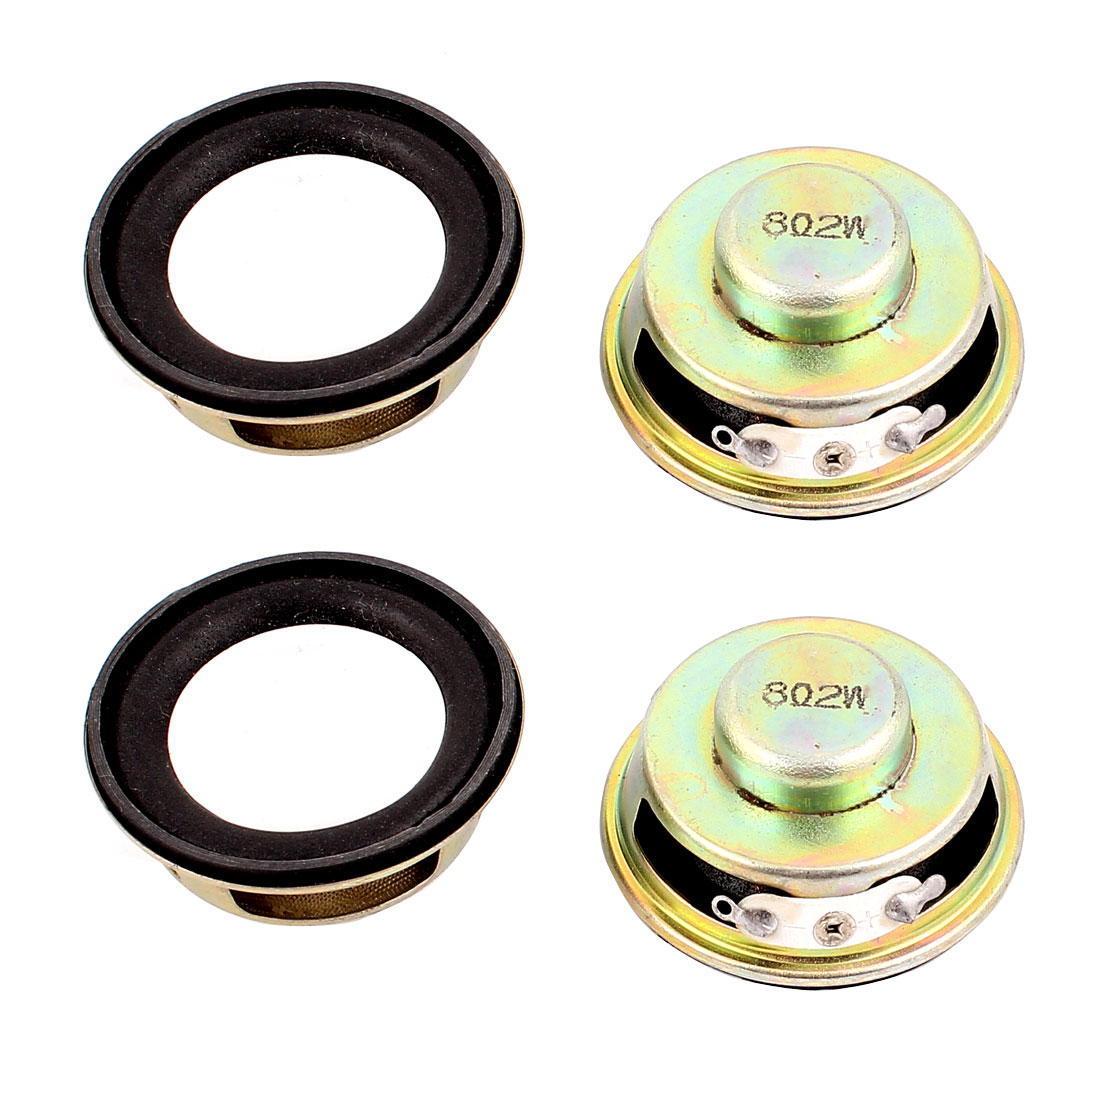 2W 8 Ohm Internal Magnet Speaker Loudspeaker 4 x 1.8cm 4Pcs